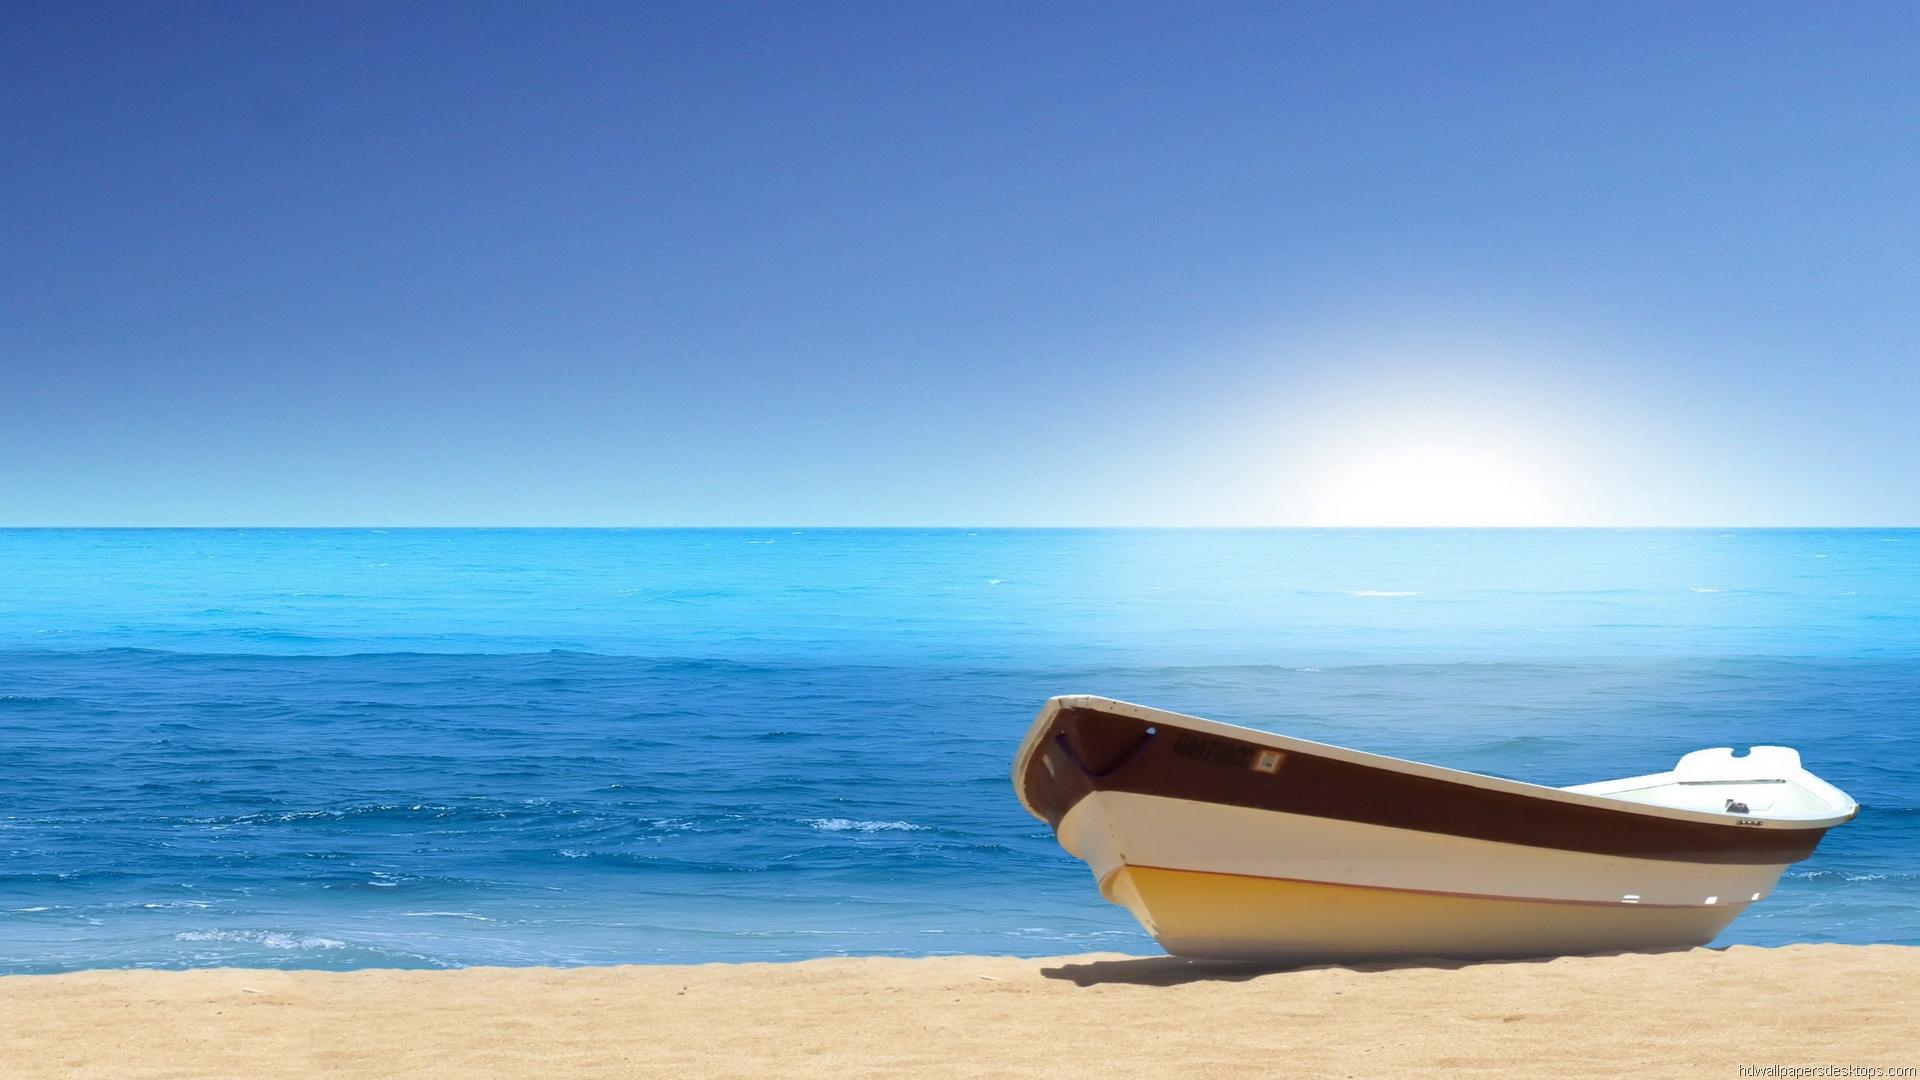 Blue-Sea-Travel-HD-wallpaper-wp3803351